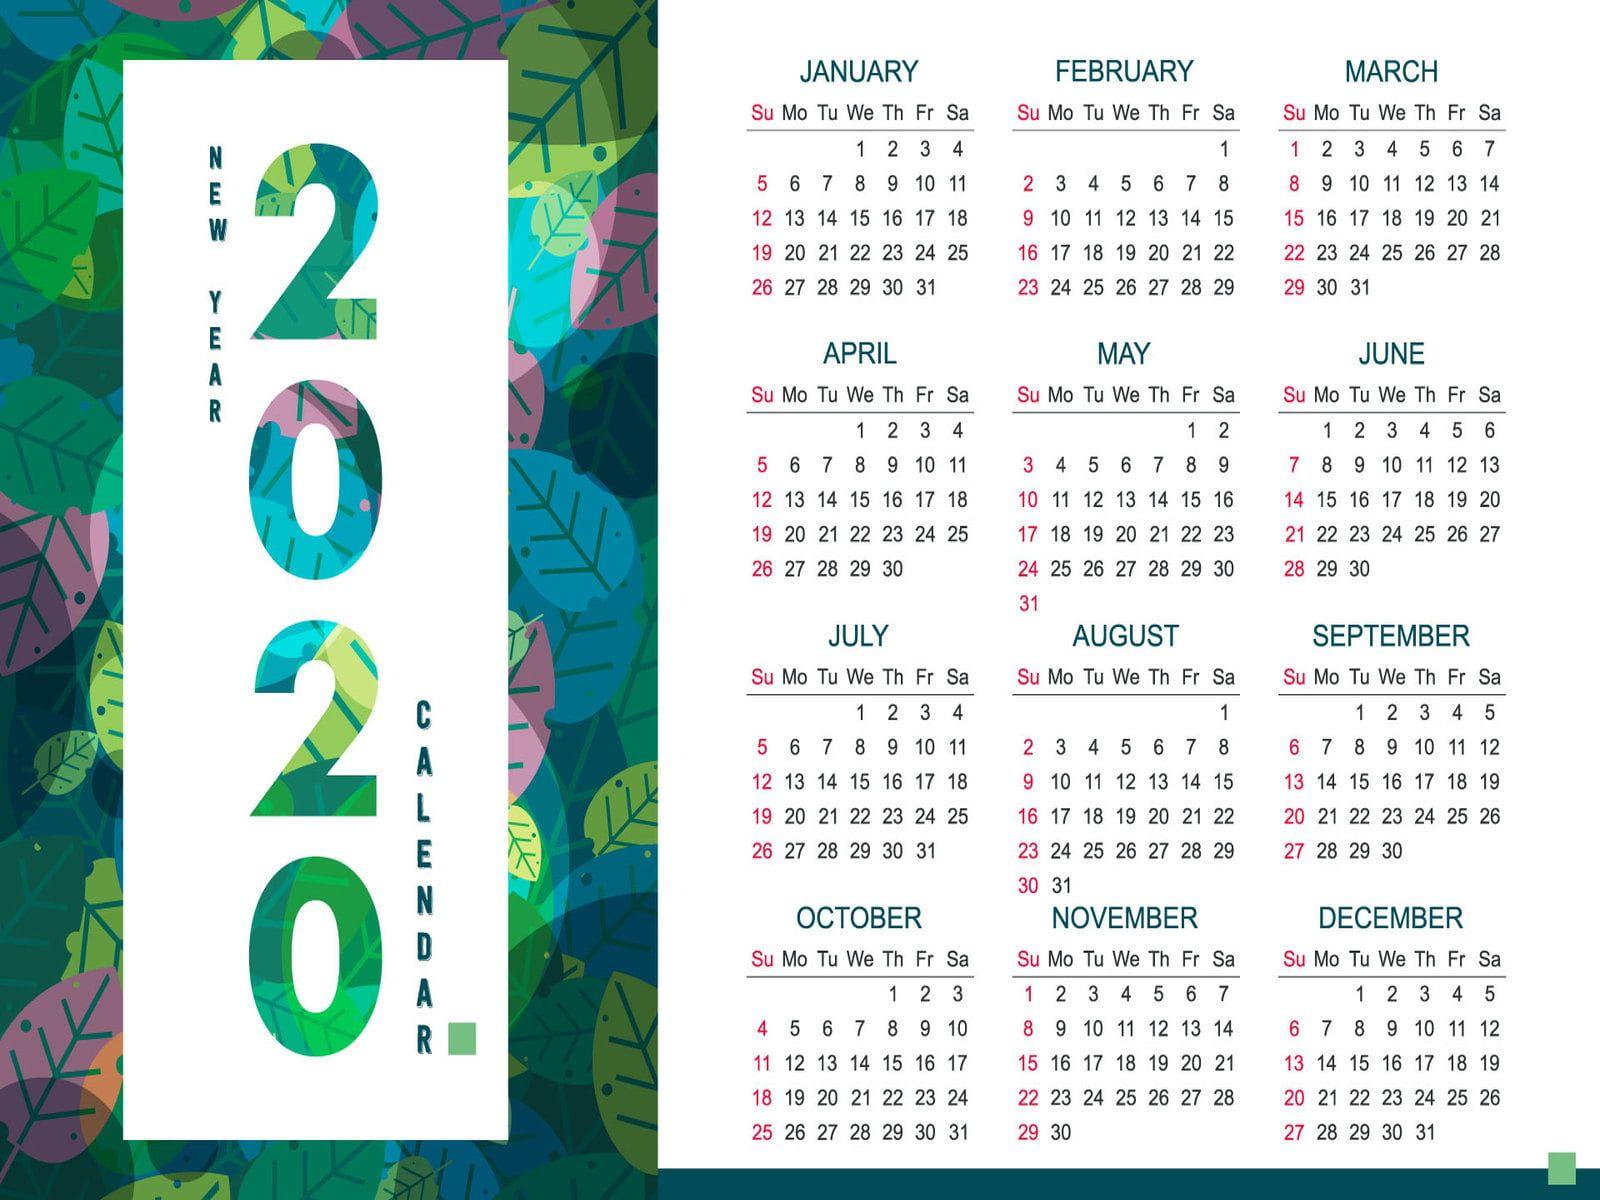 Calendar 2020 Year Numbers Month Leaves 720p Wallpaper Hdwallpaper Desktop In 2020 New Year Calendar Calendar Design Calendar